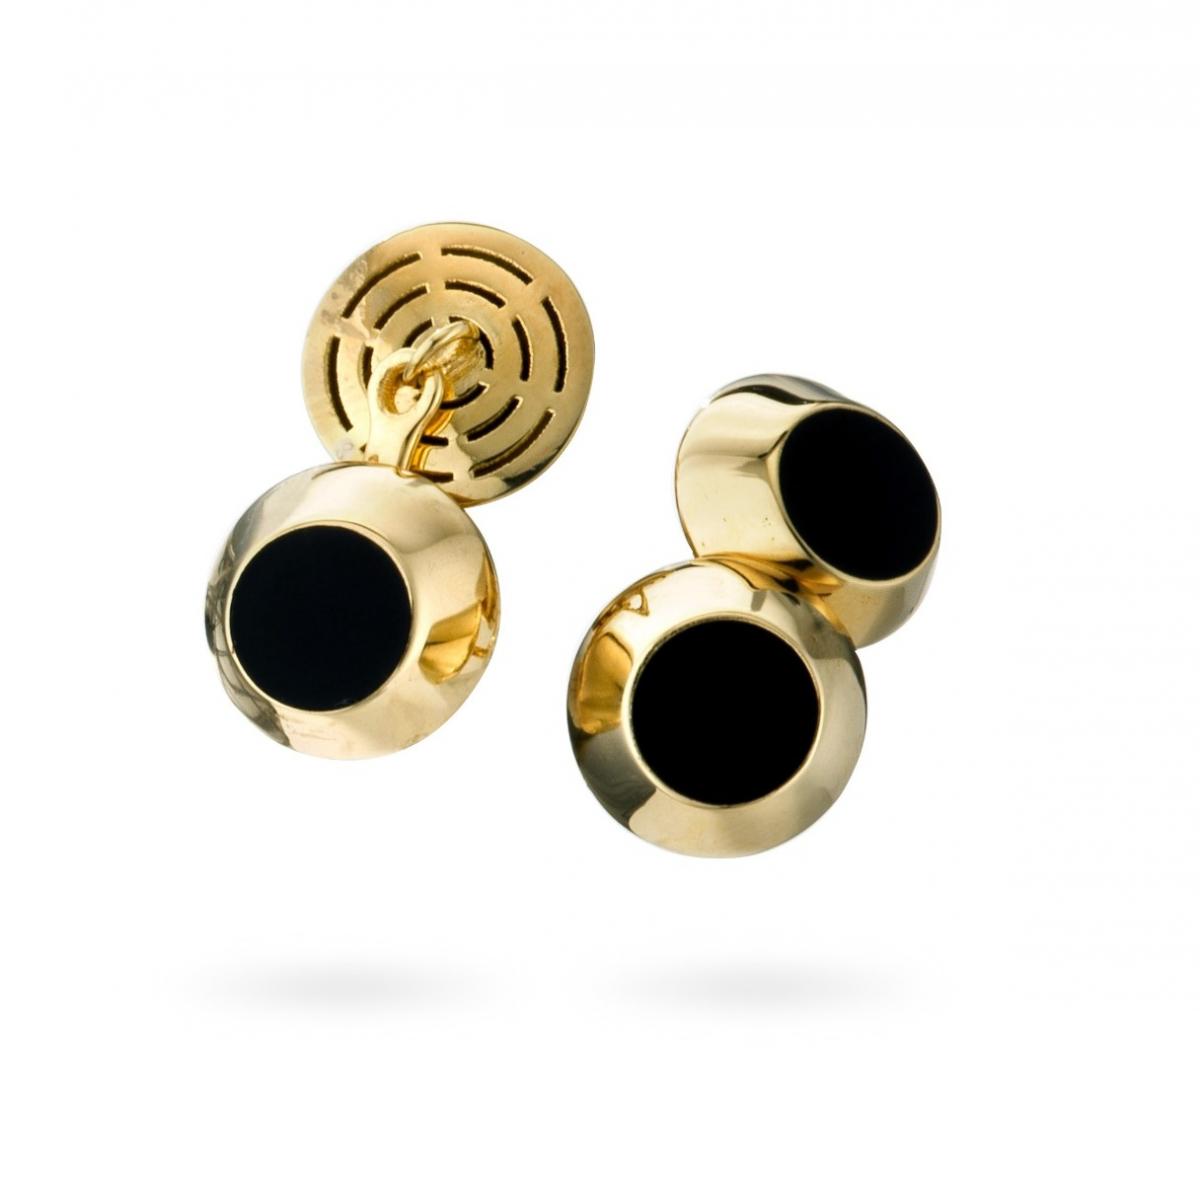 Onyx Cufflinks in 18Kt Yellow Gold